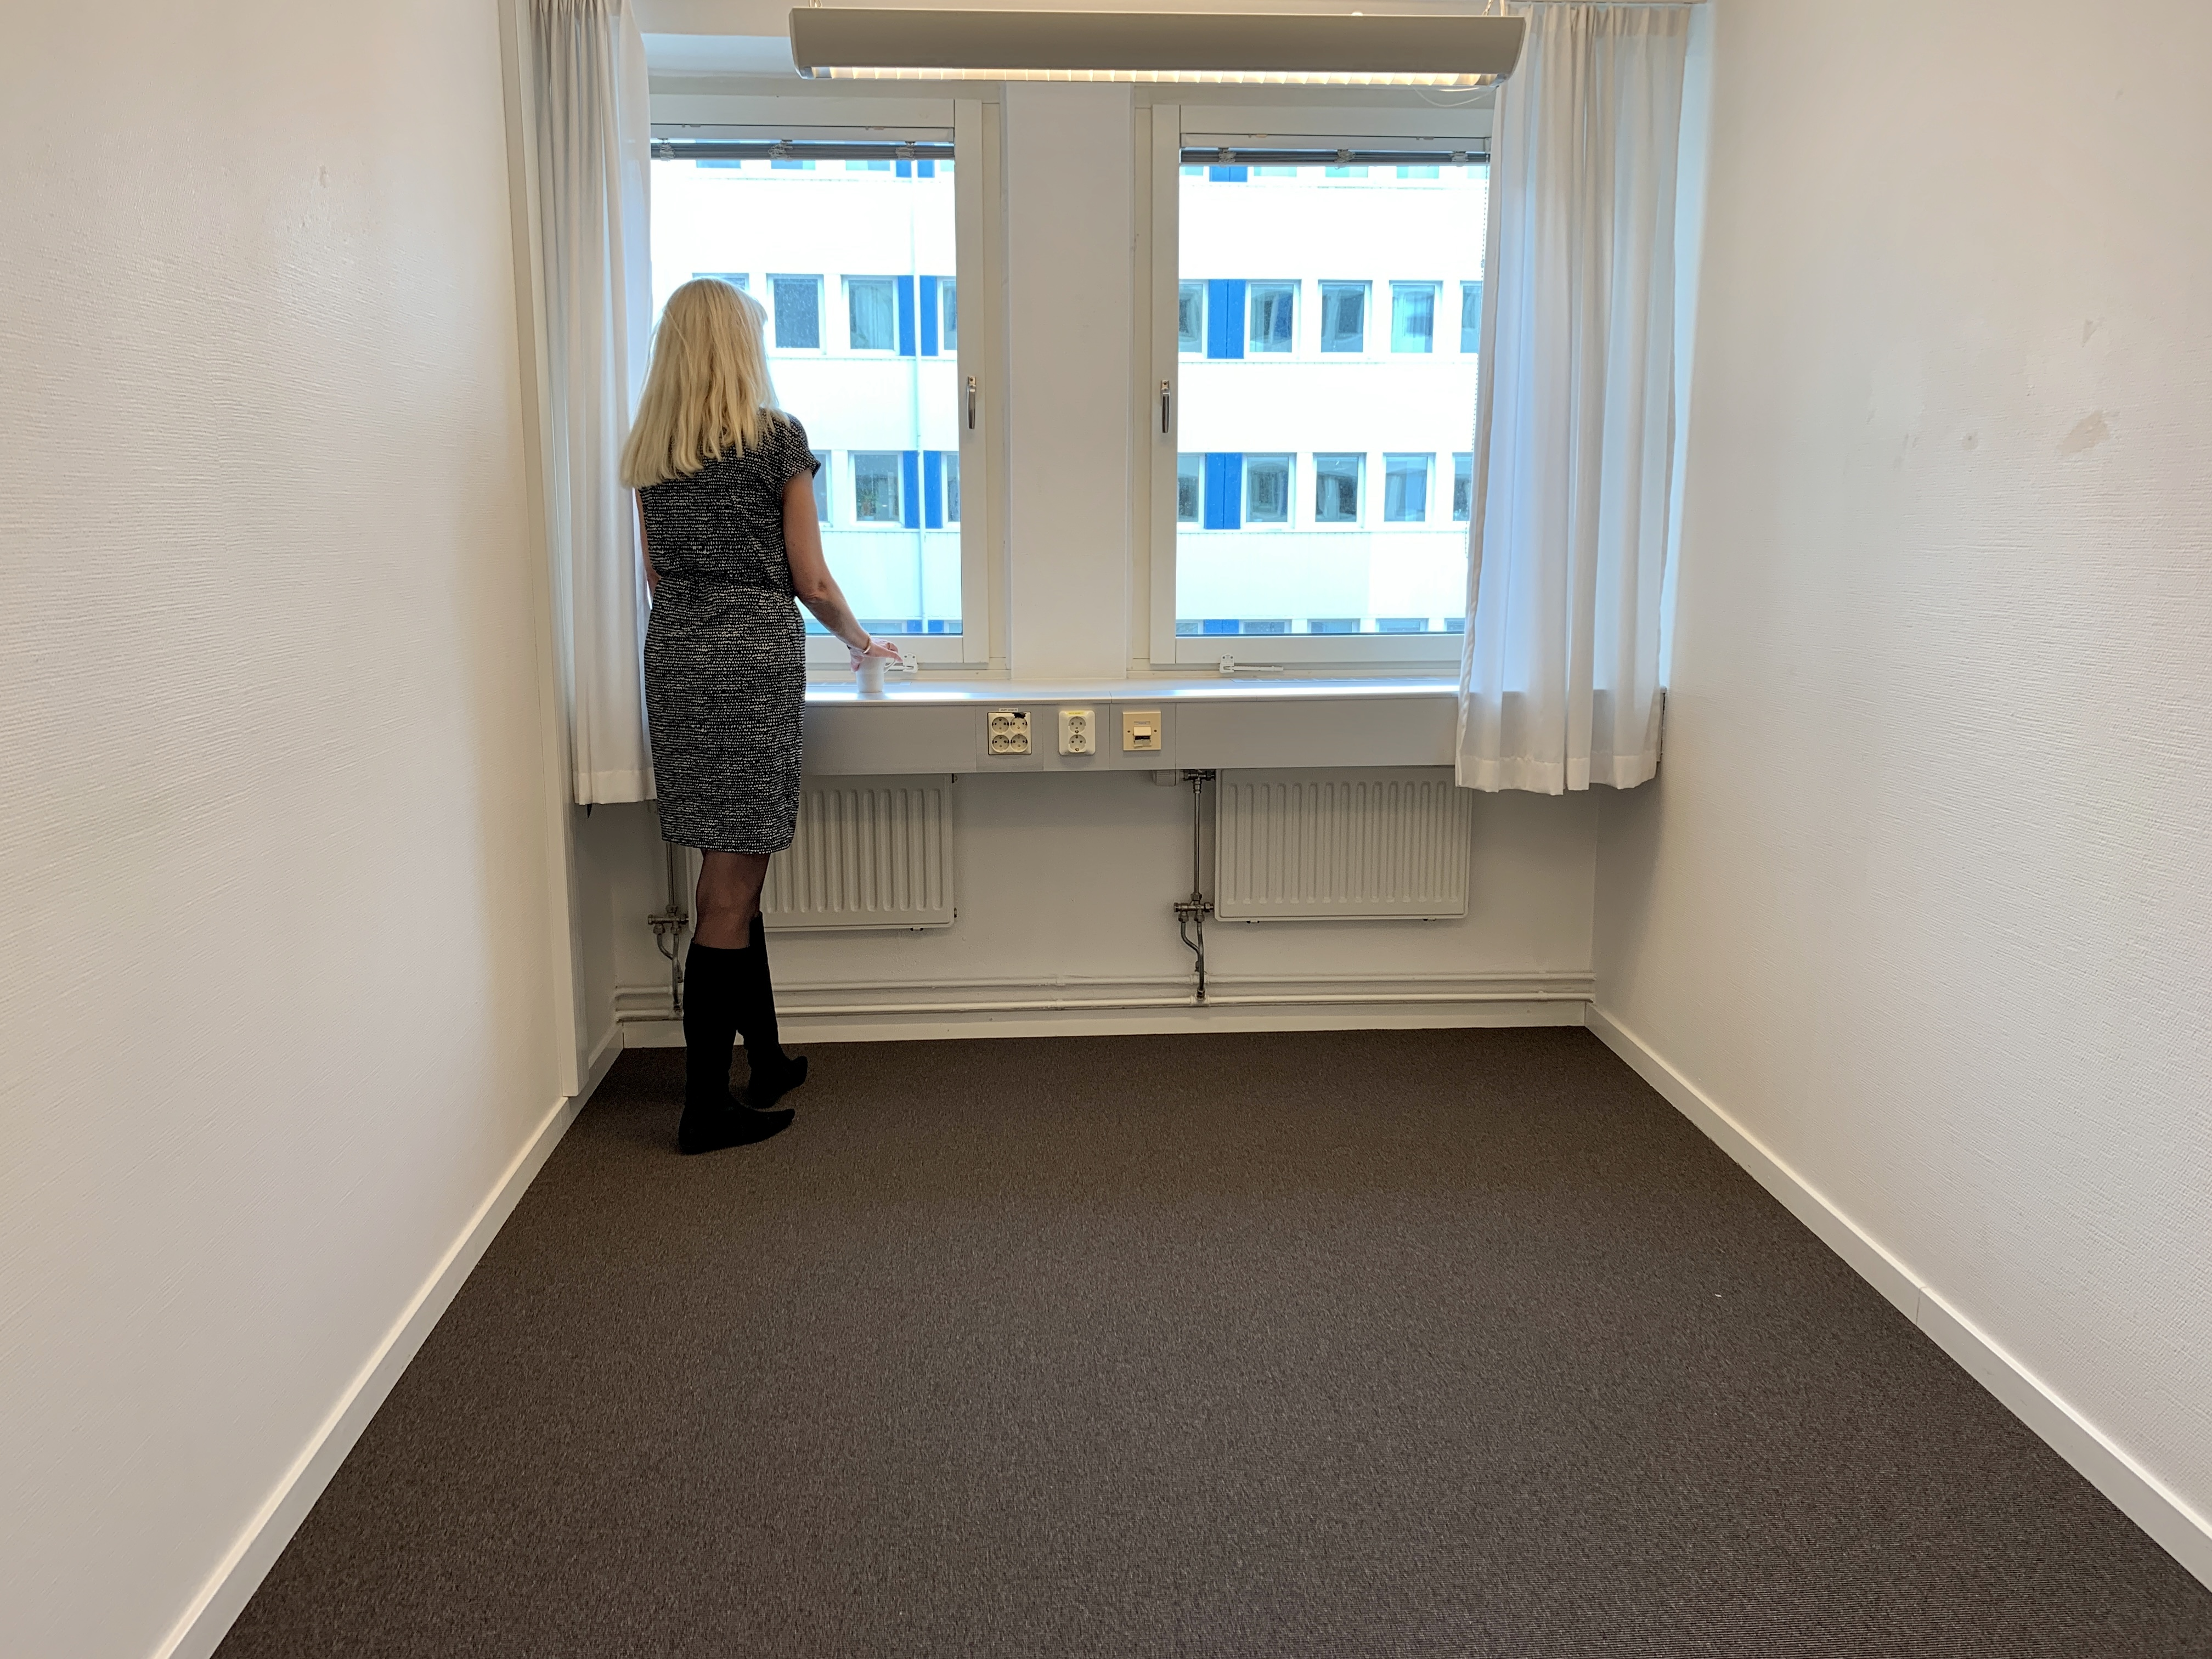 Centrala minikontor kontorshotell World Trade Center Göteborg